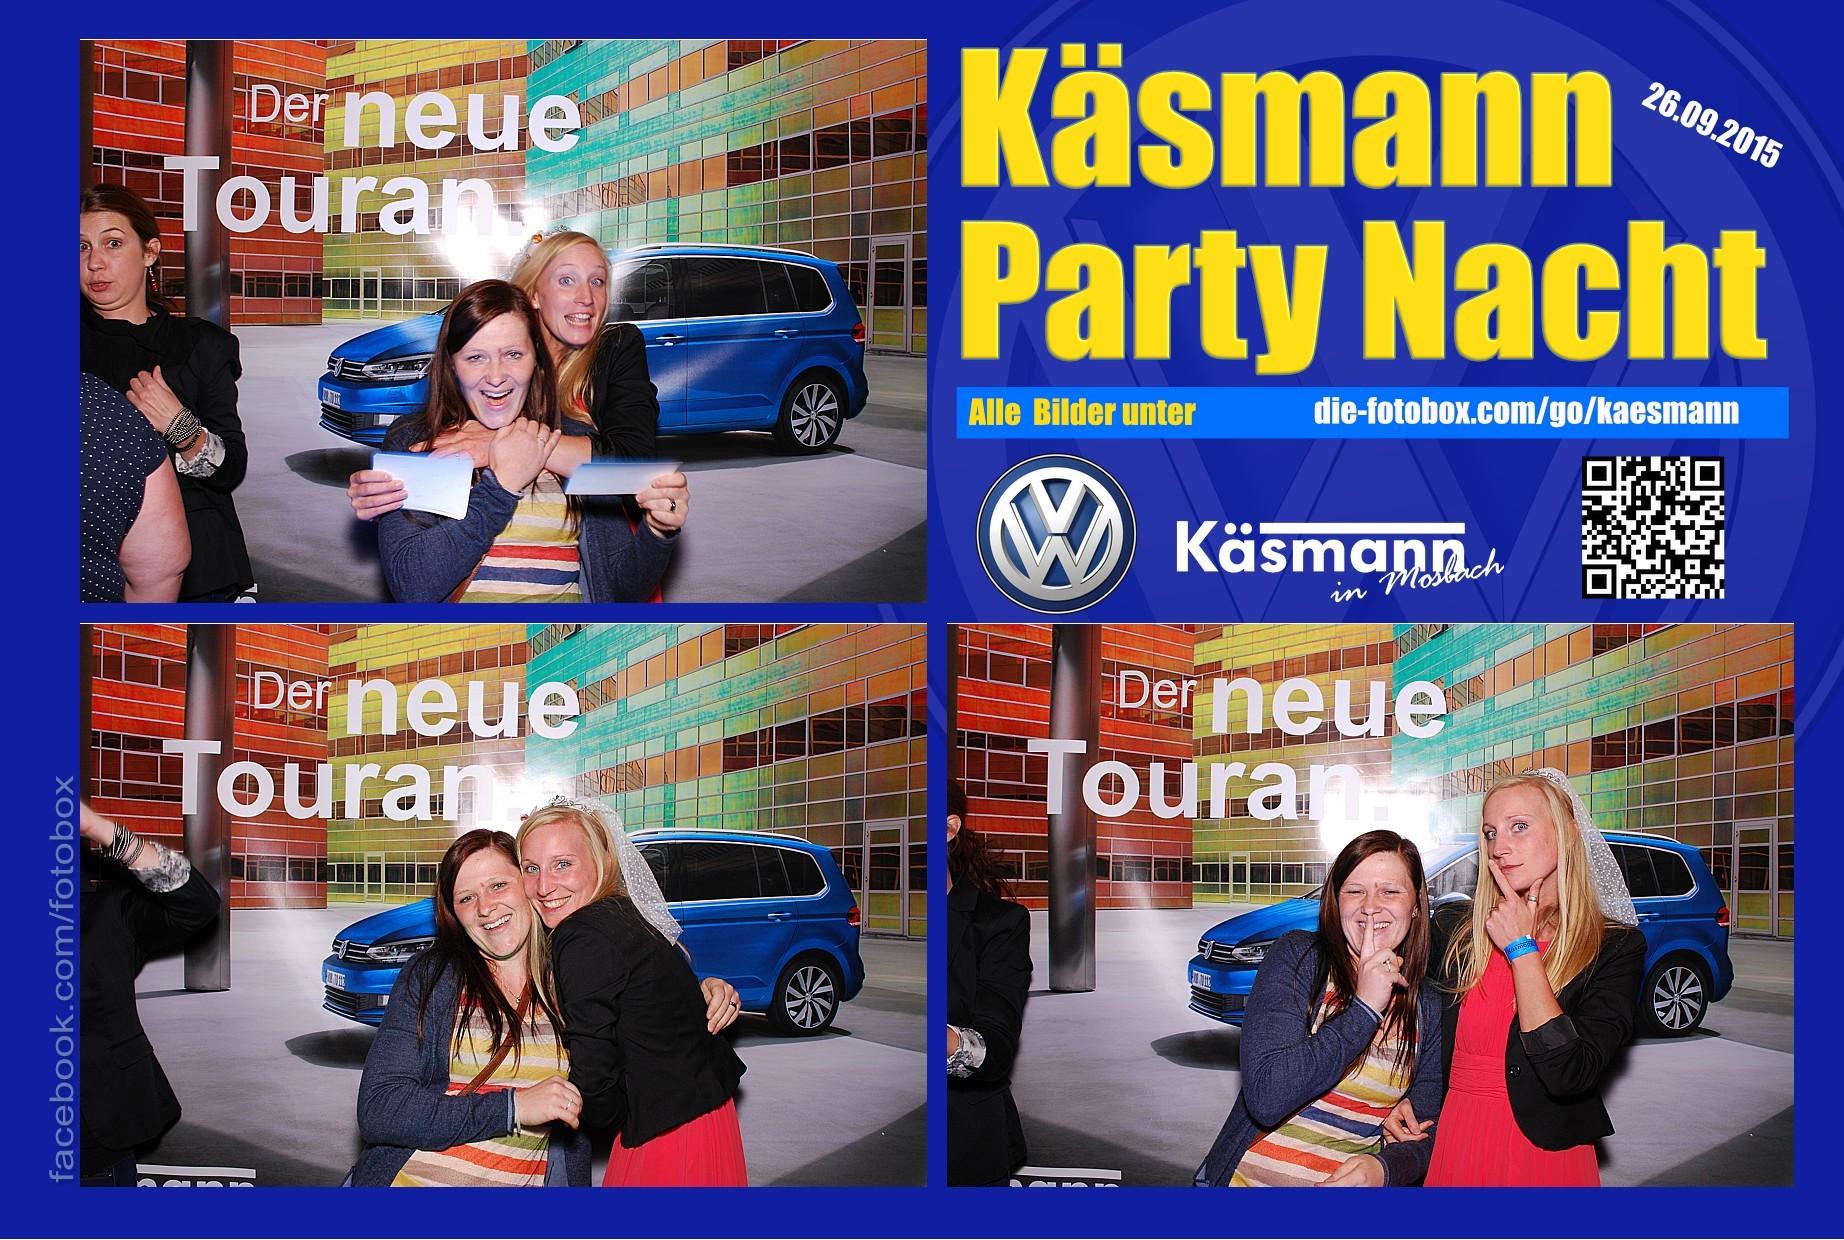 Käsmannparty 2015 - www.die-fotobox.com 01032